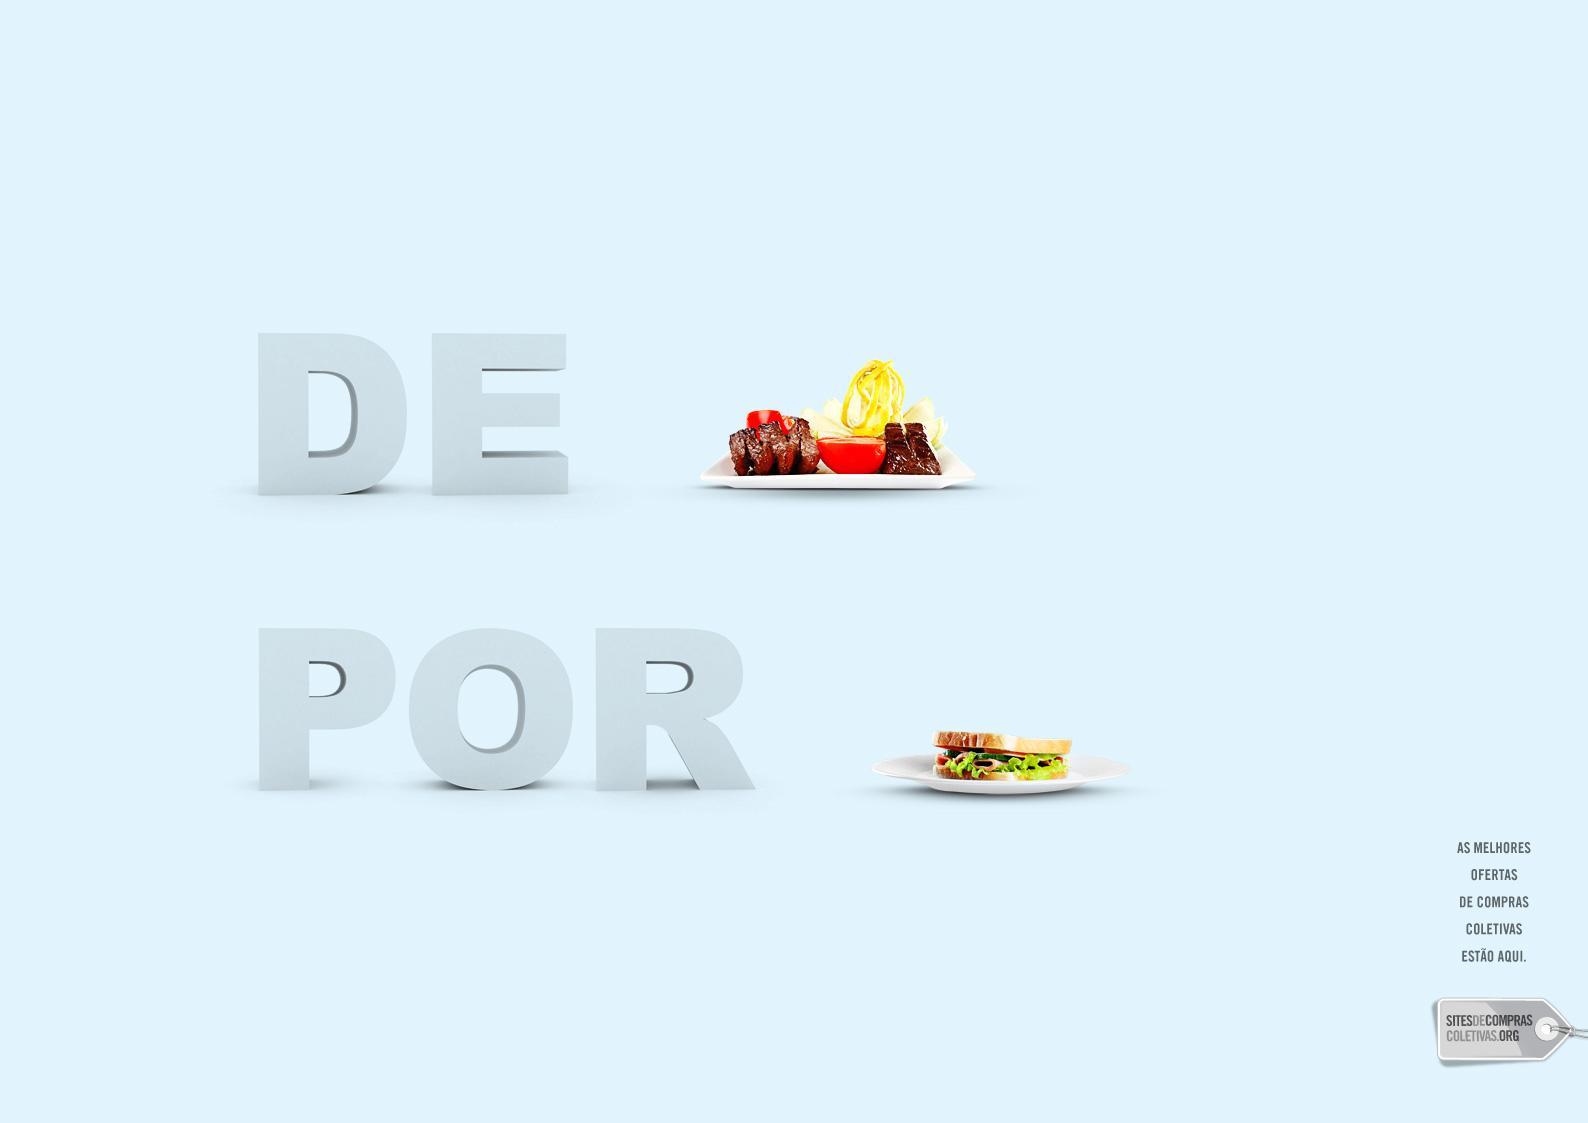 Sitesdecomprascoletivas.org Print Ad -  Food